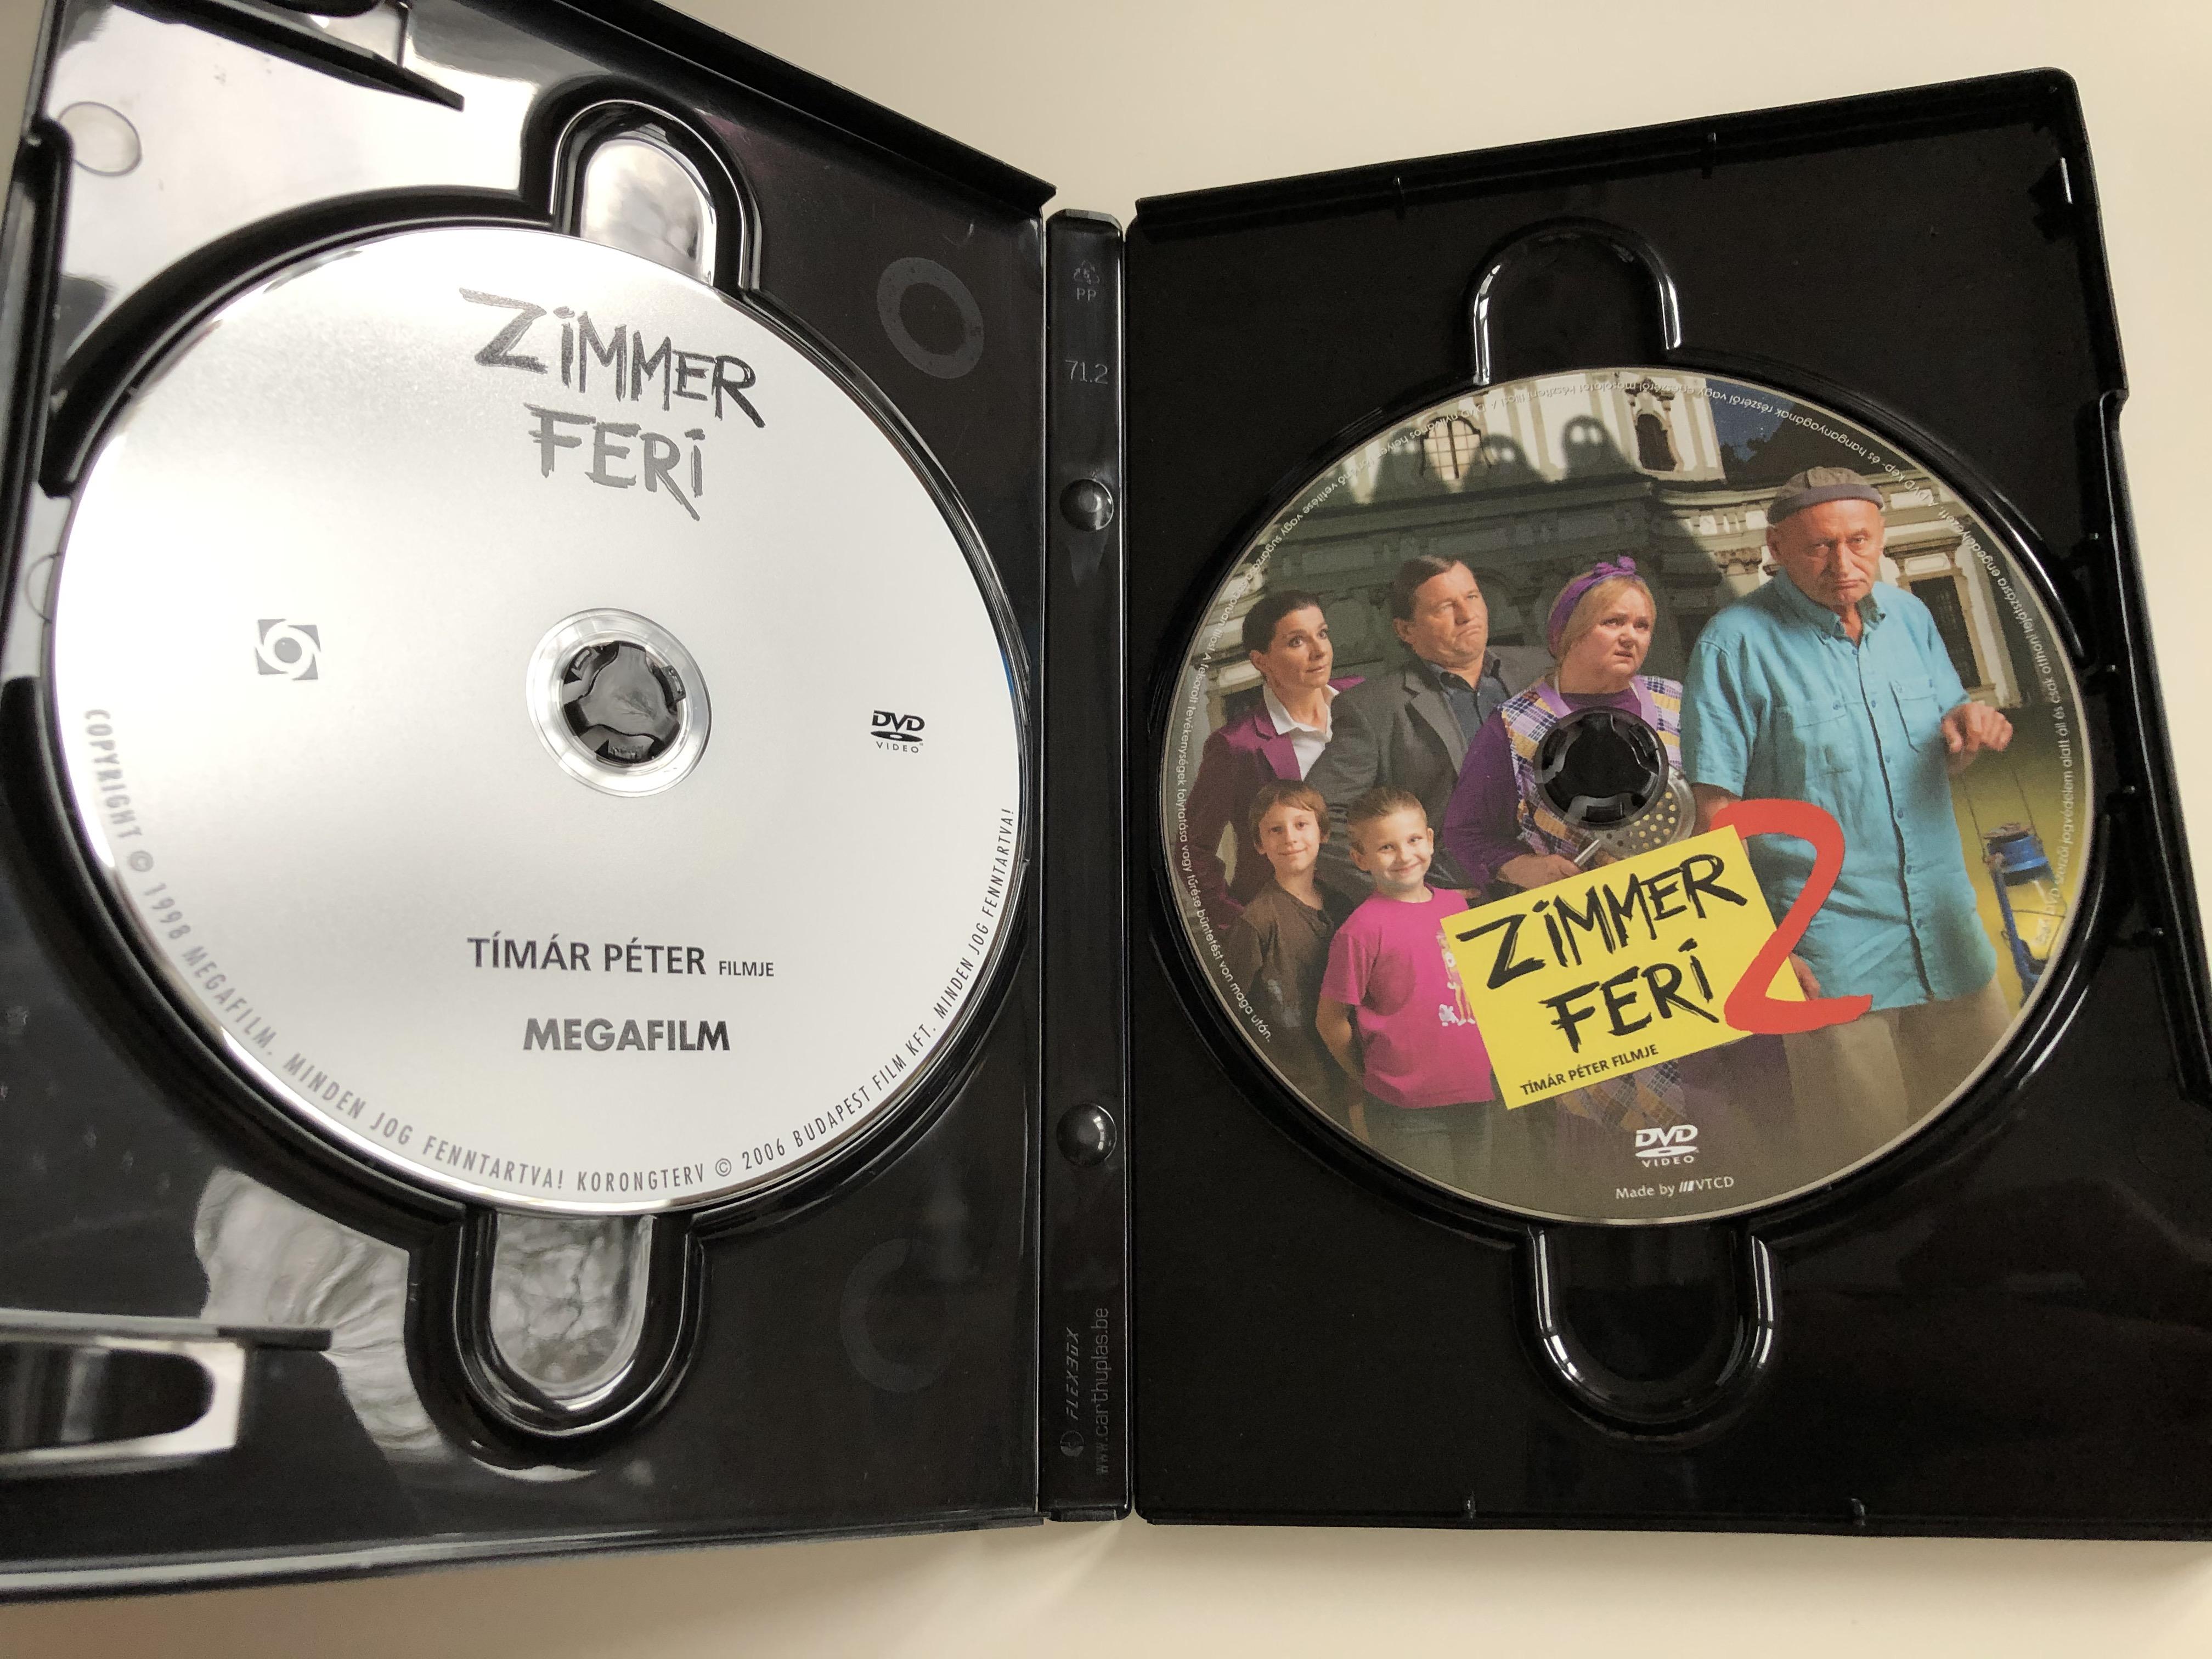 zimmer-feri-2-dvd-2010-aj-nd-k-zimmer-feri-1-2.jpg